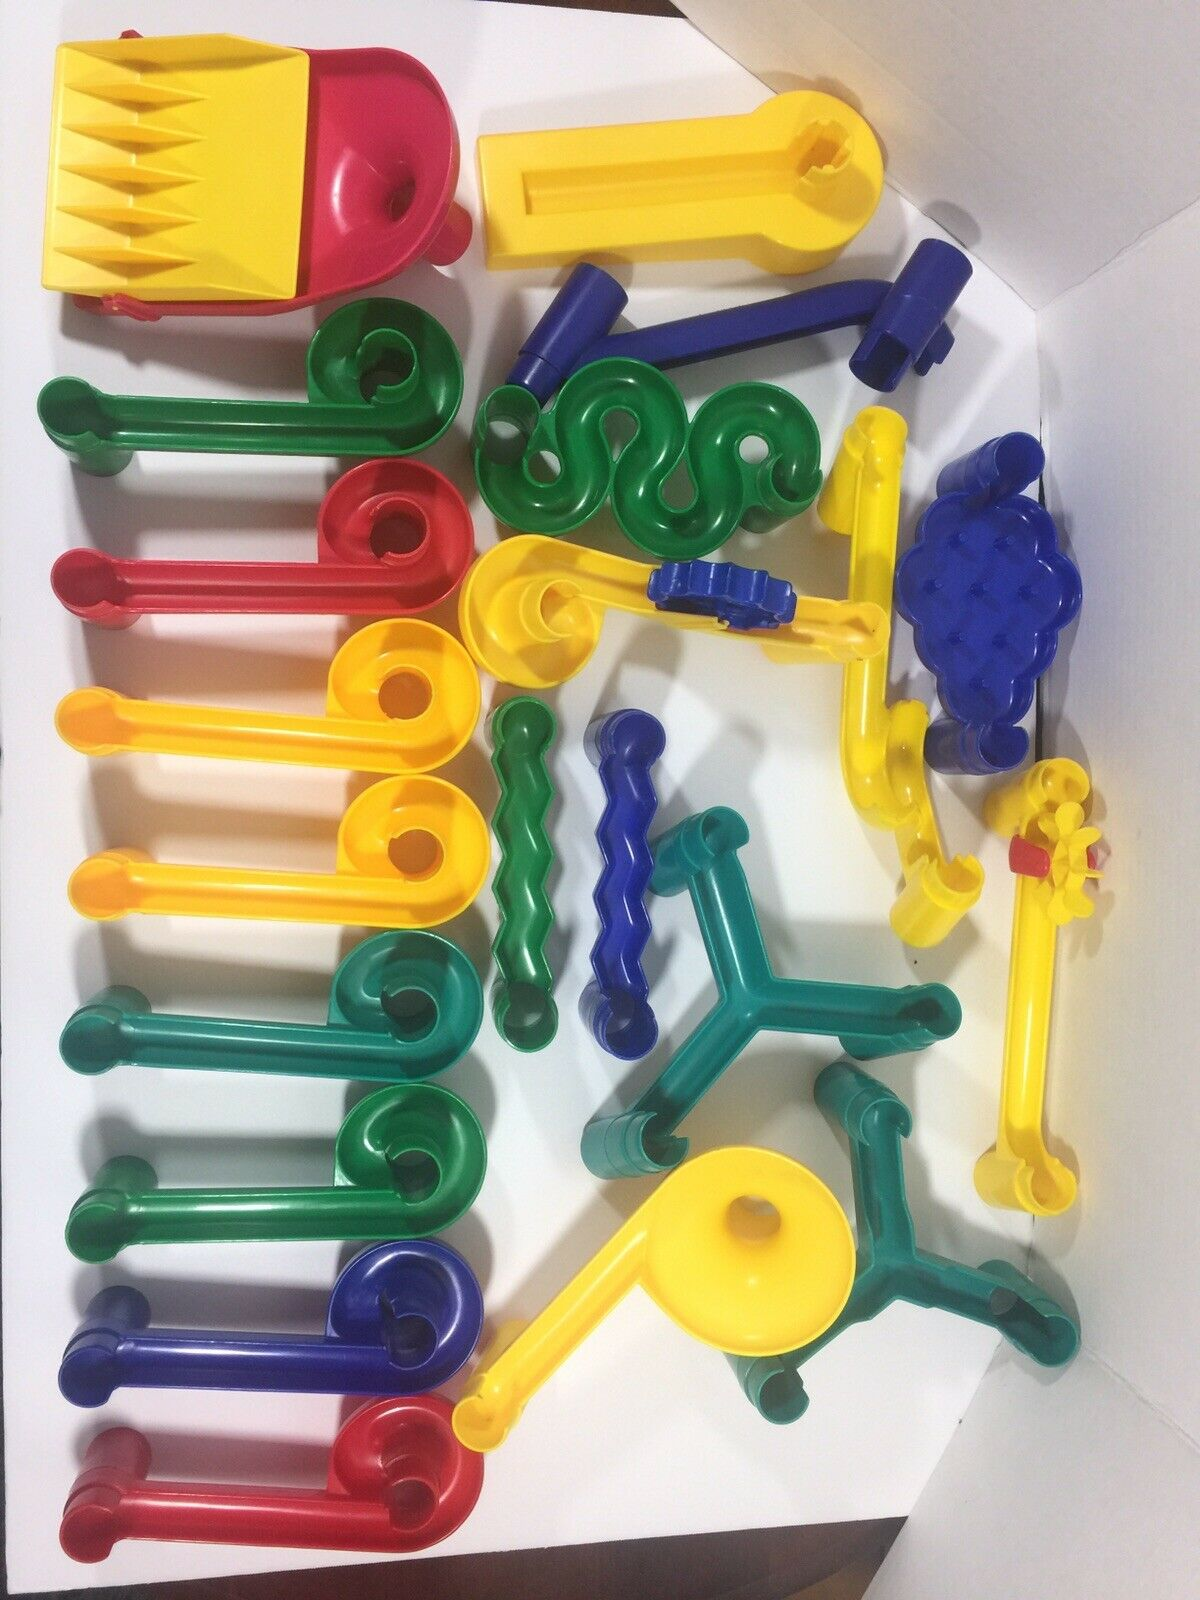 Discovery Toys Vtg Marble Maze Pieces STEM Fun Educational Educational Educational Engineering 65 Pieces 3f687e